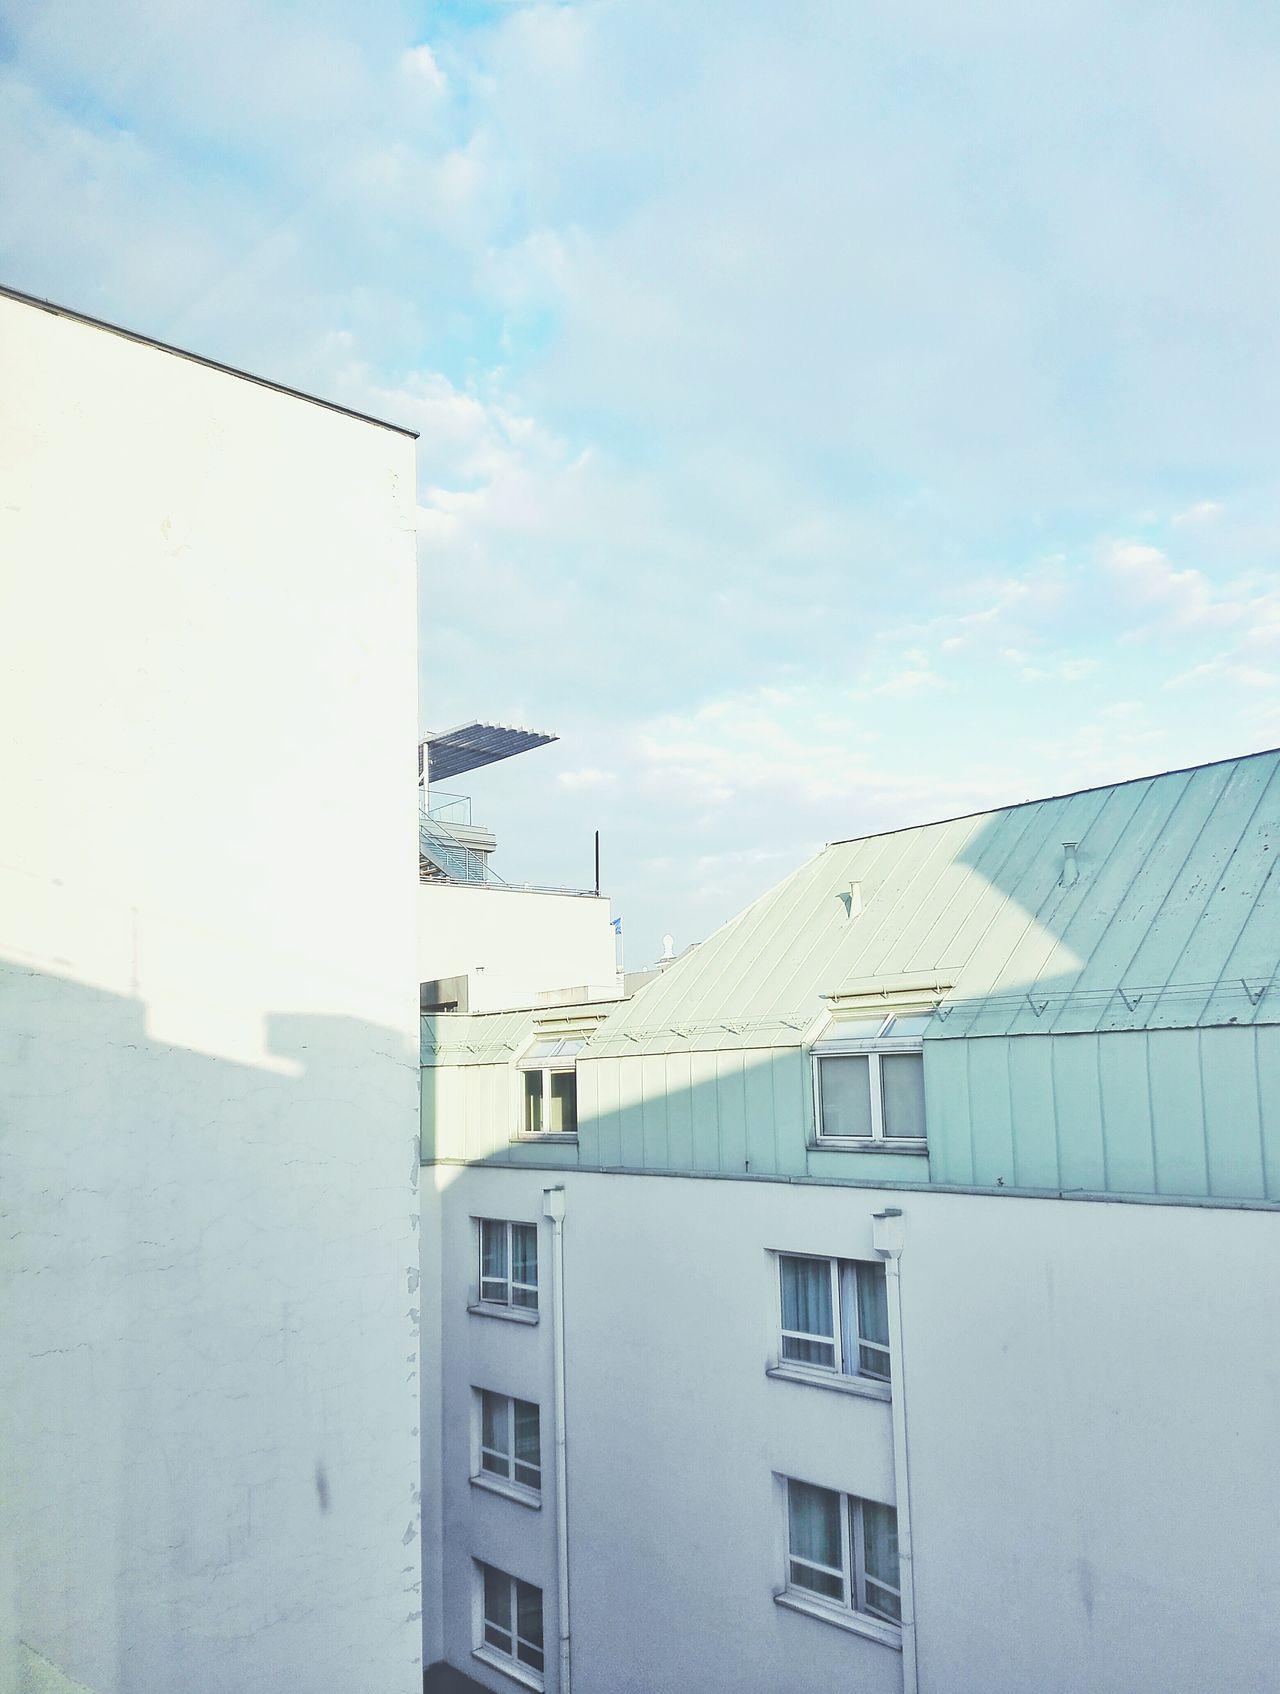 Beautiful stock photos of guten morgen,  Architecture,  Austria,  Building Exterior,  Built Structure